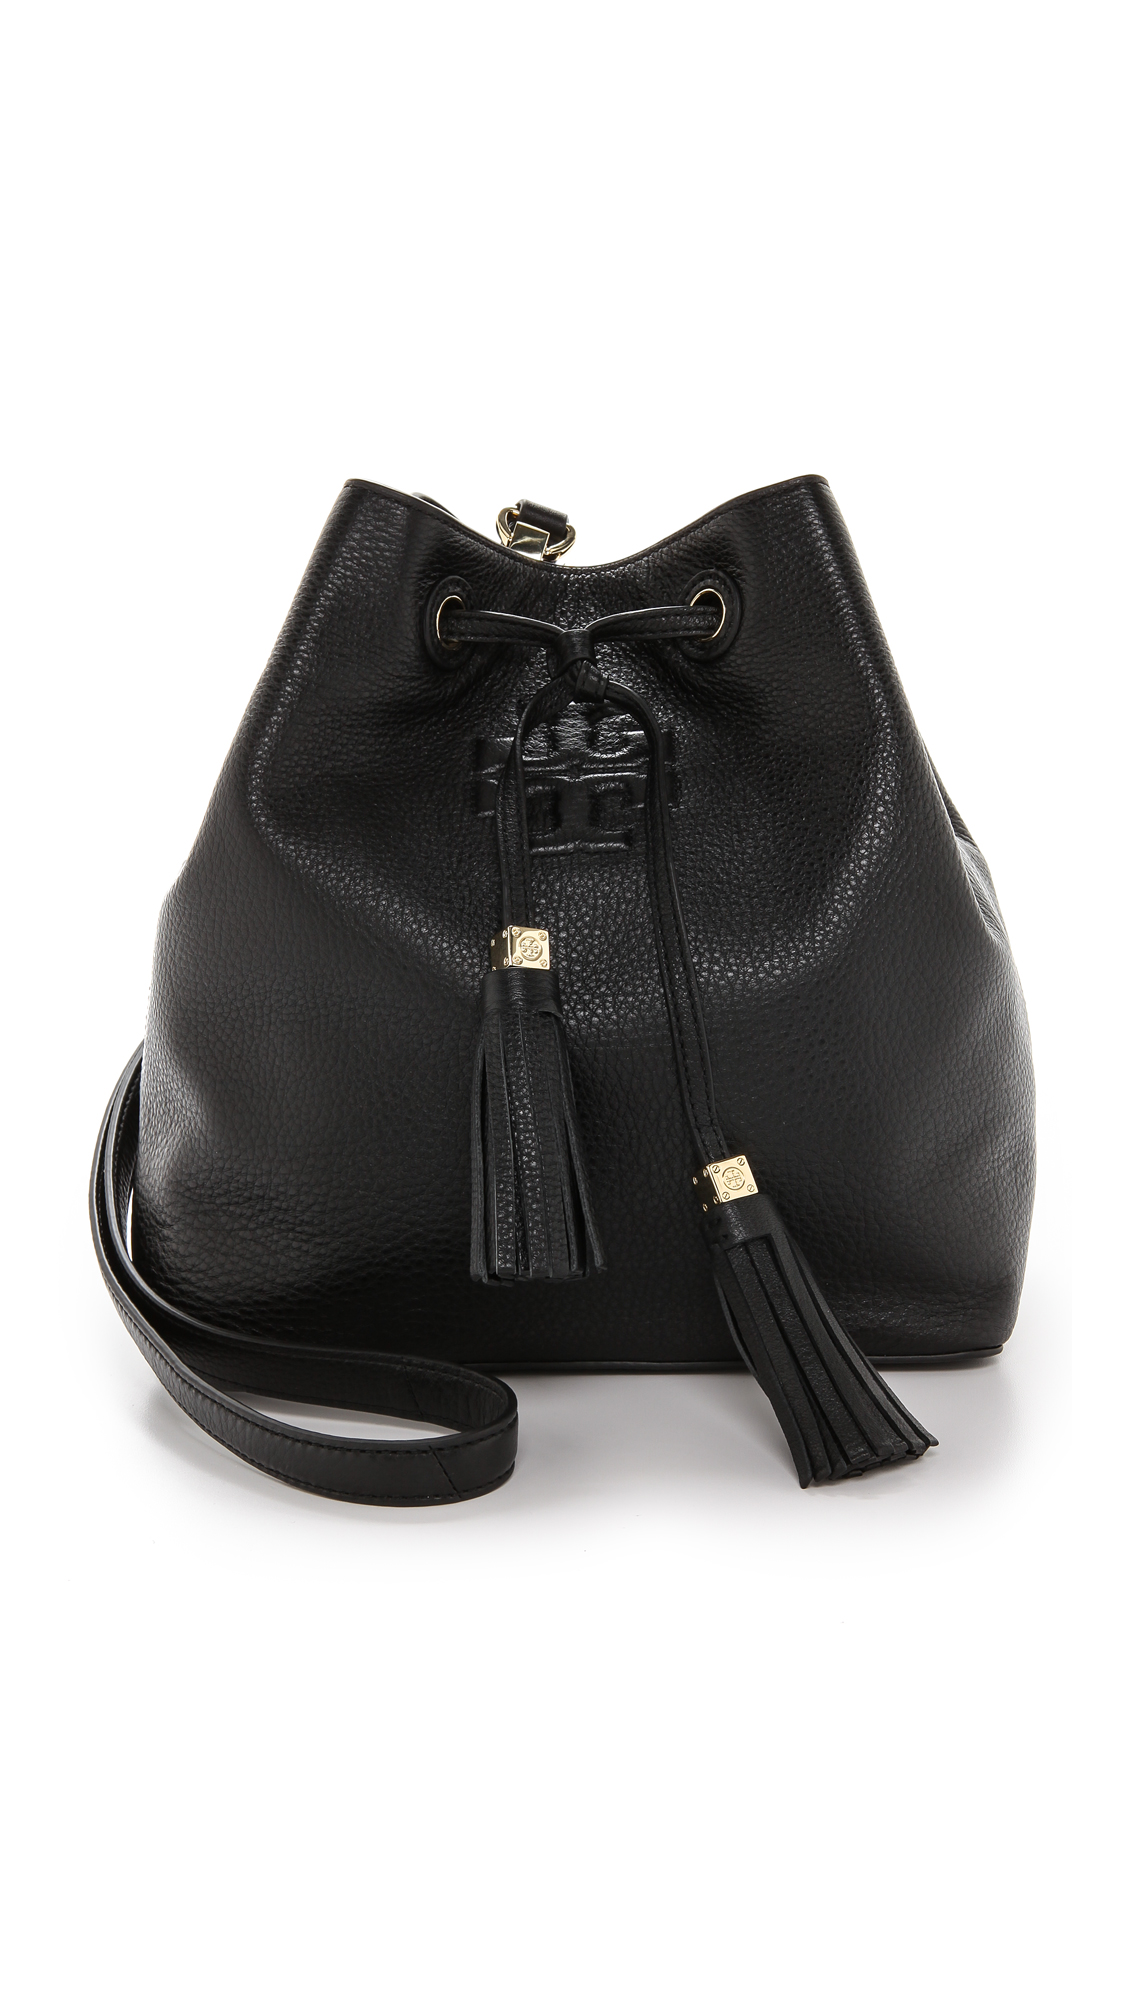 134fbef5e8be Tory Burch Thea Bucket Bag